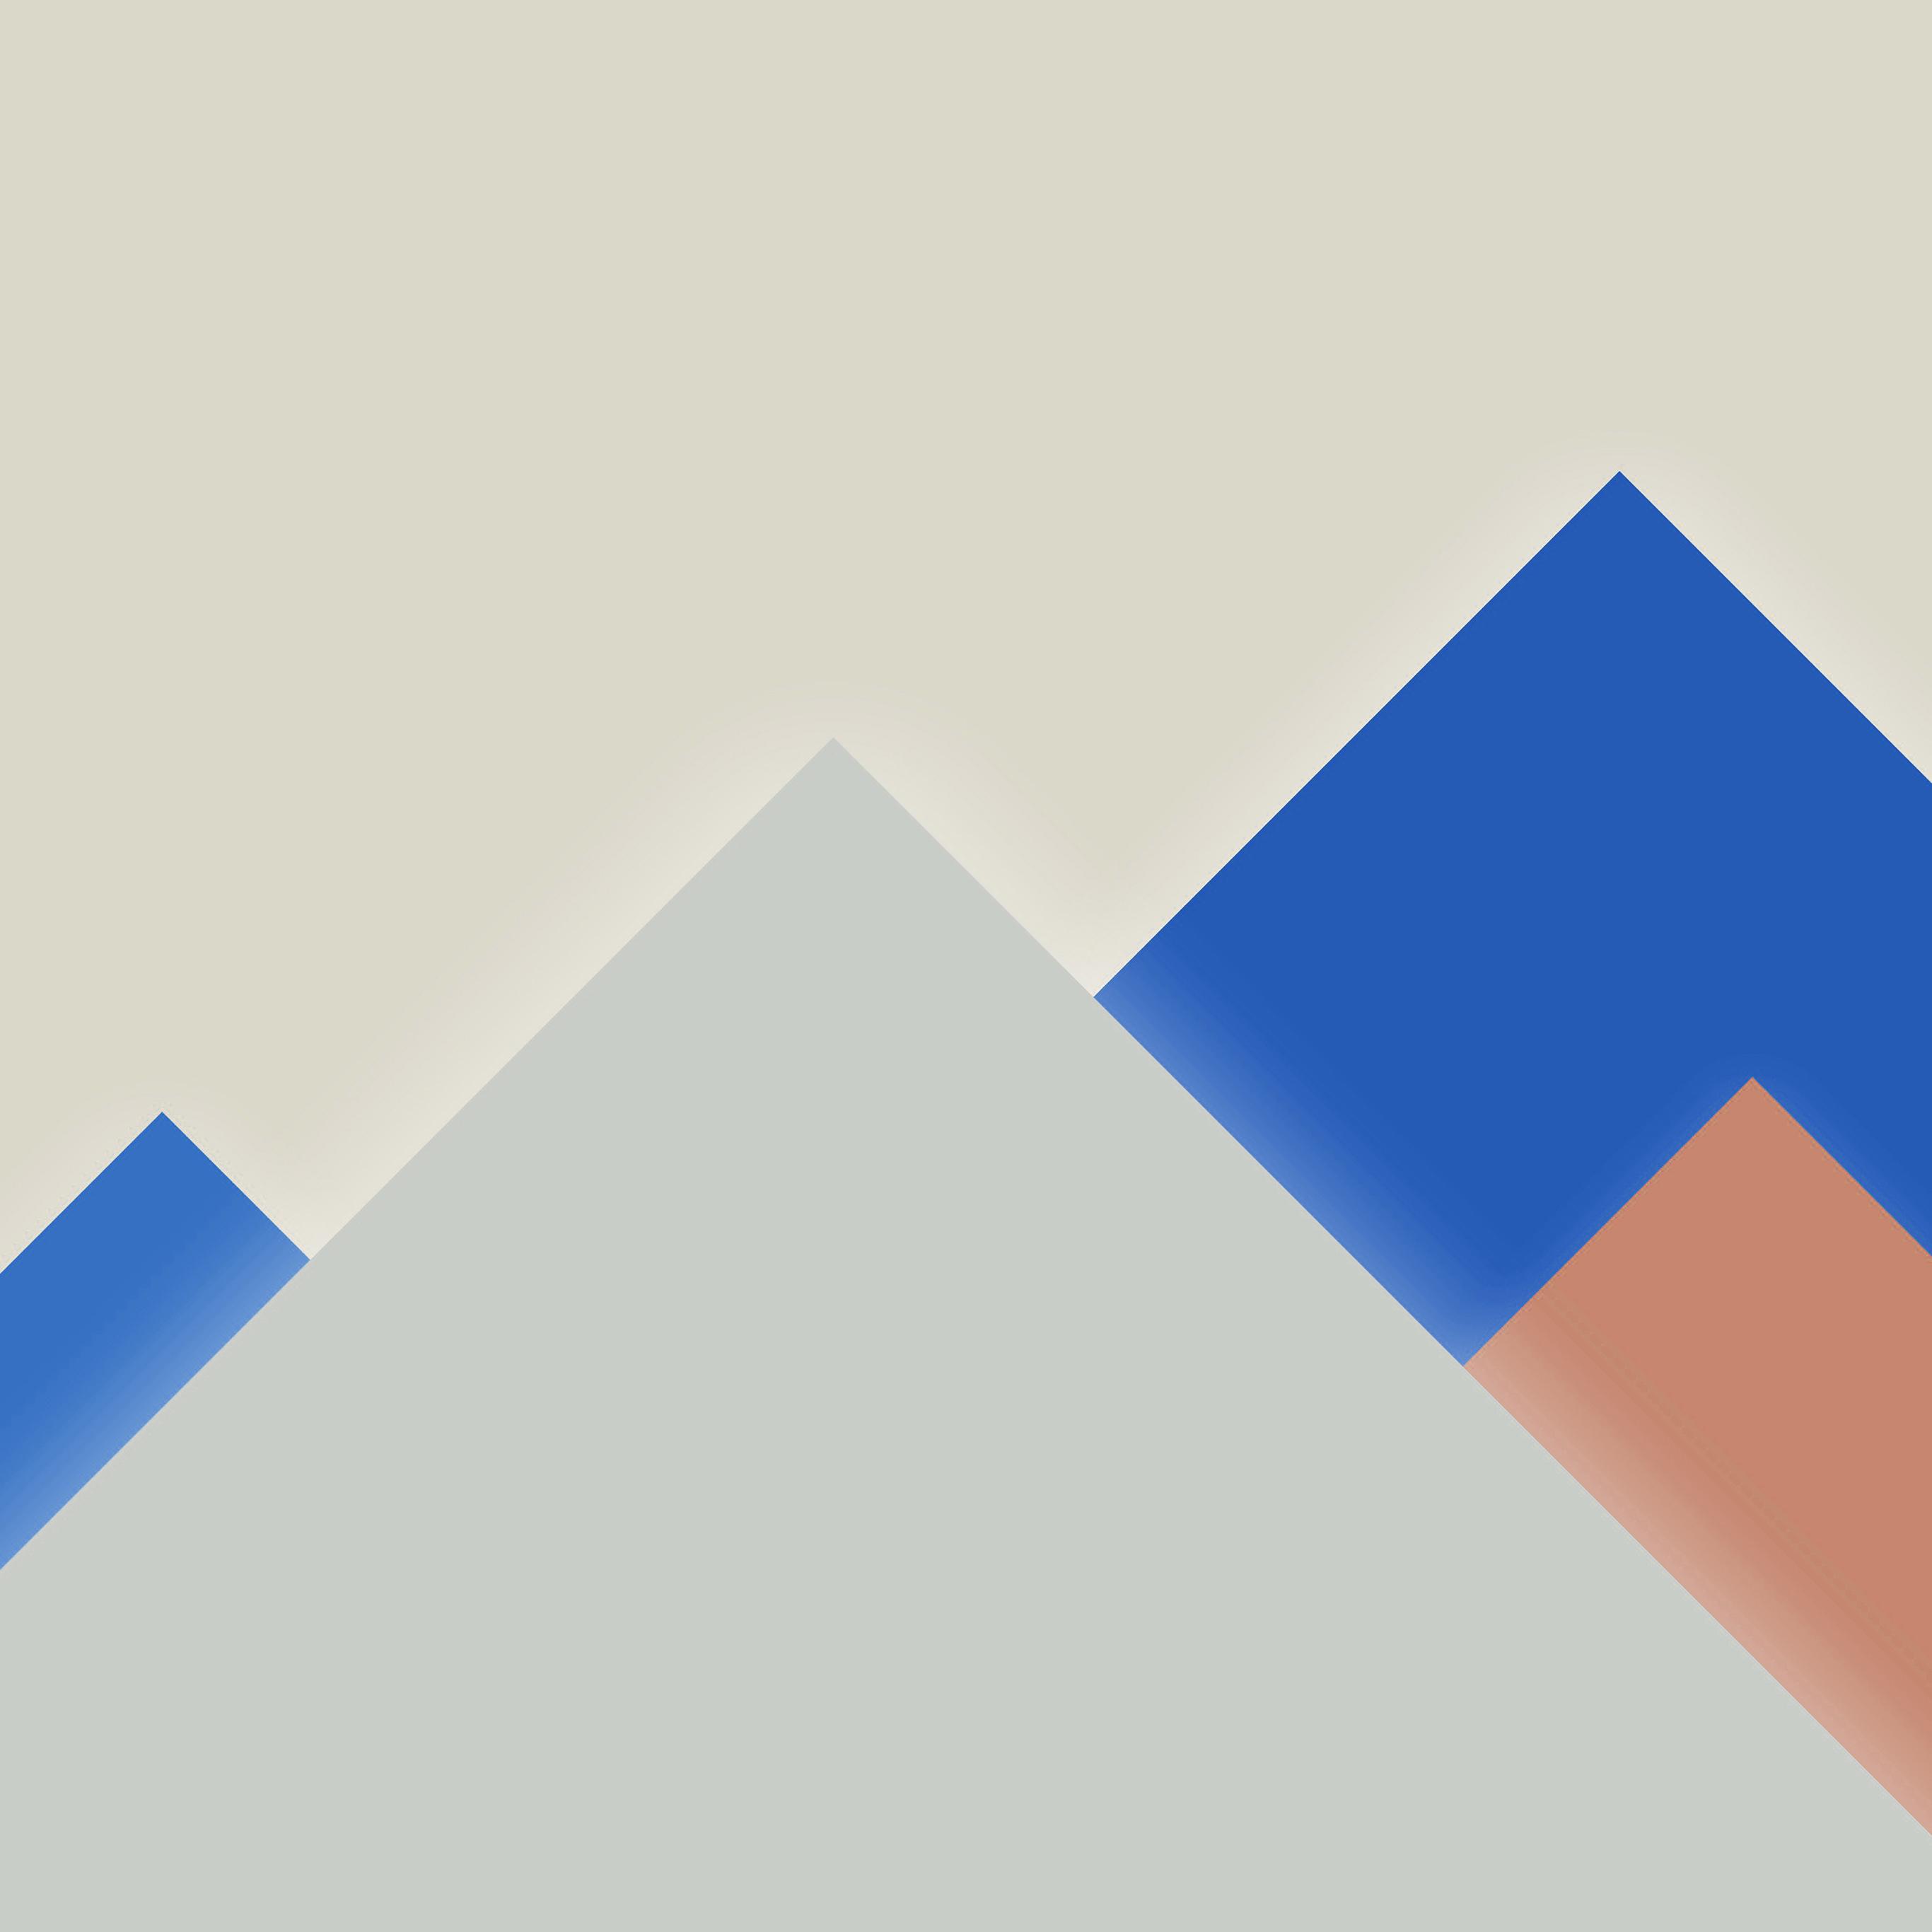 material design wallpaper blue - photo #11